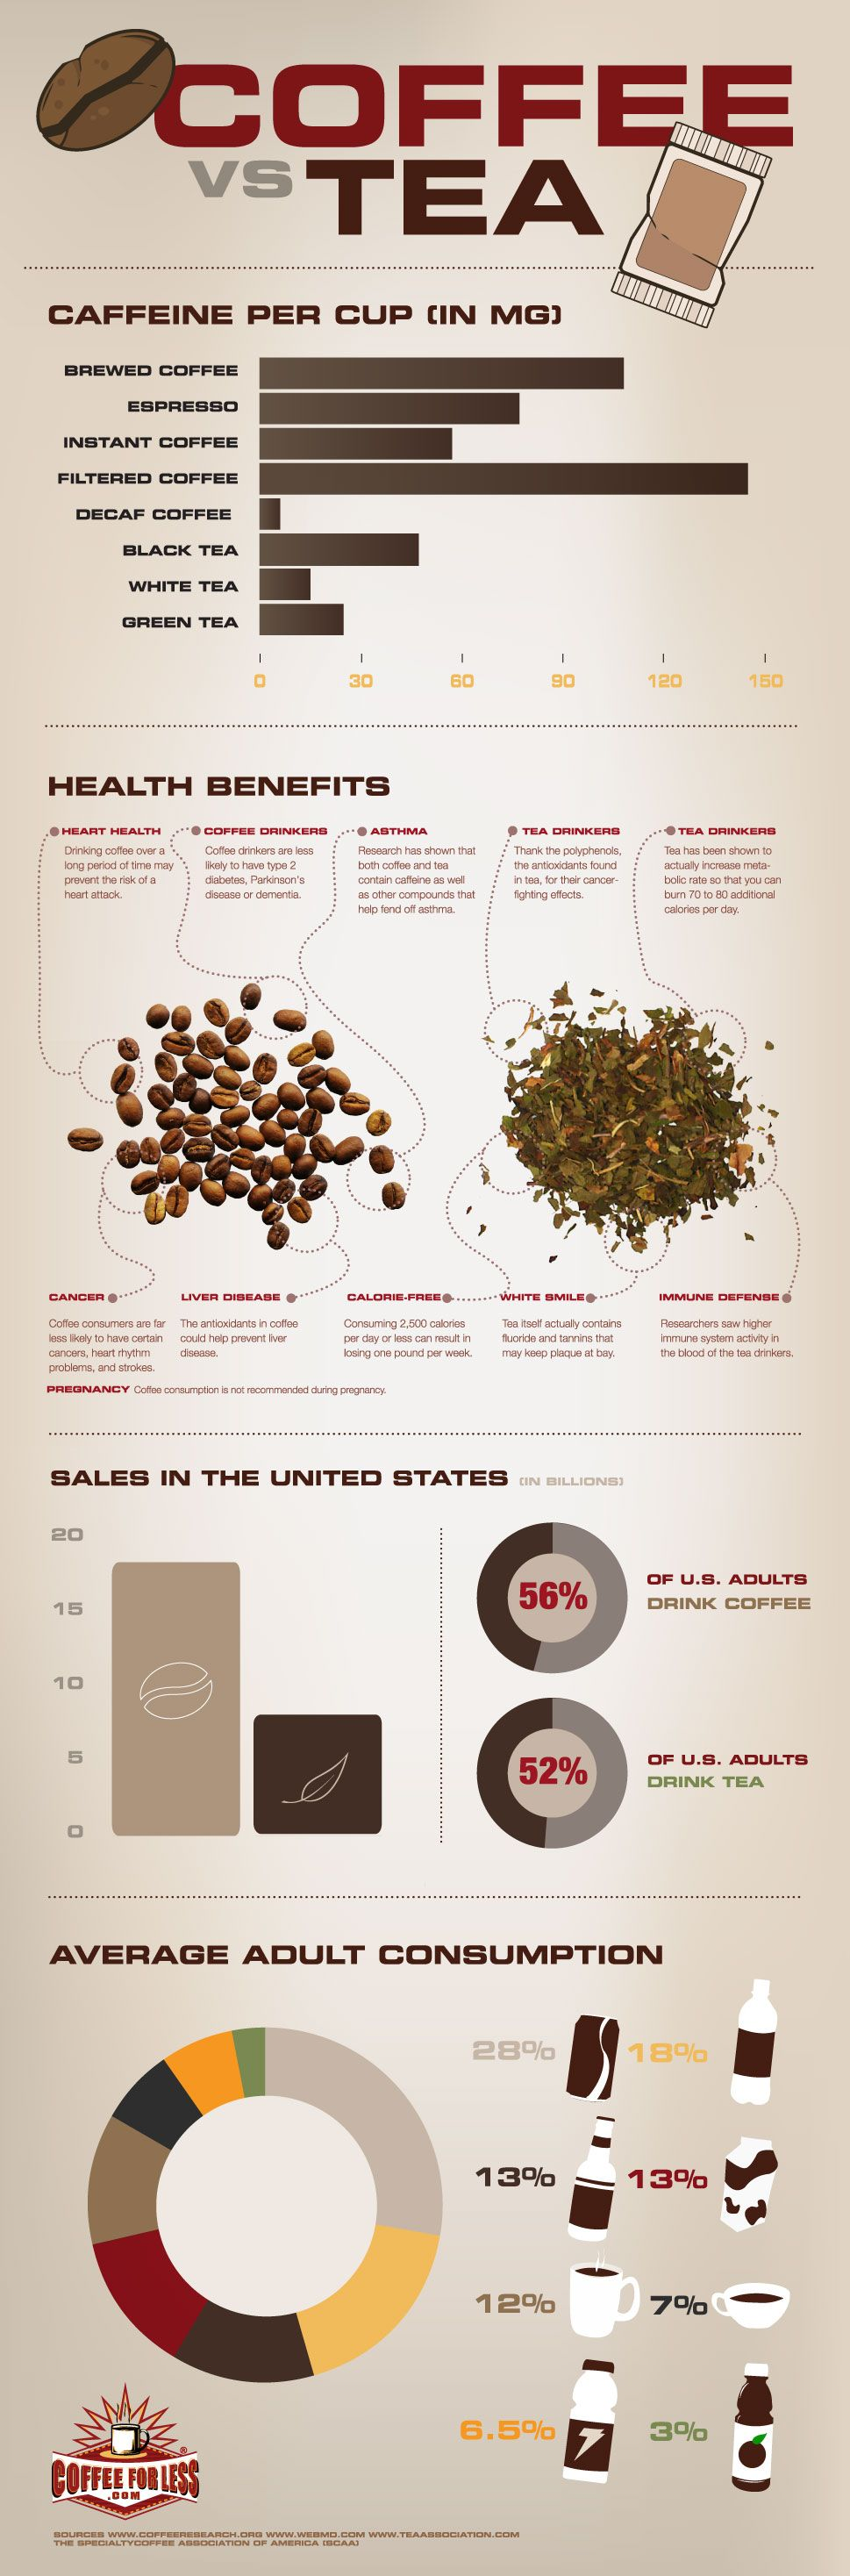 Coffee Vs Tea Statistics Coffee Vs Tea Tea Infographic Green Tea Vs Coffee